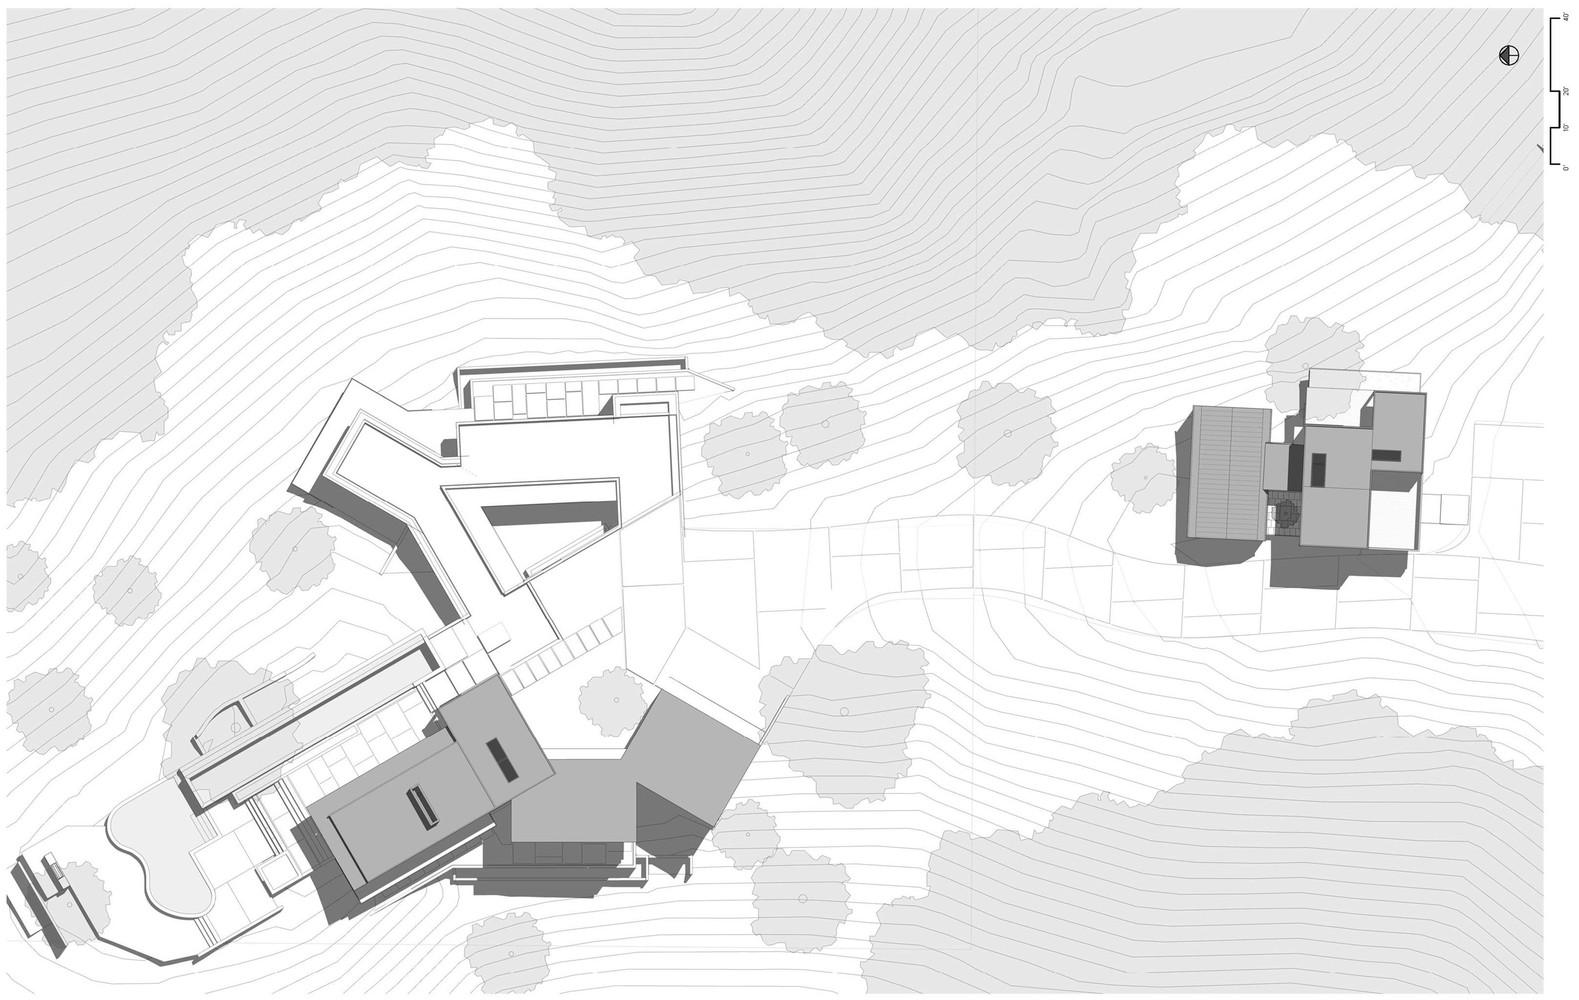 9603 OPR PRESENTATION large site plan.tif (Copy)